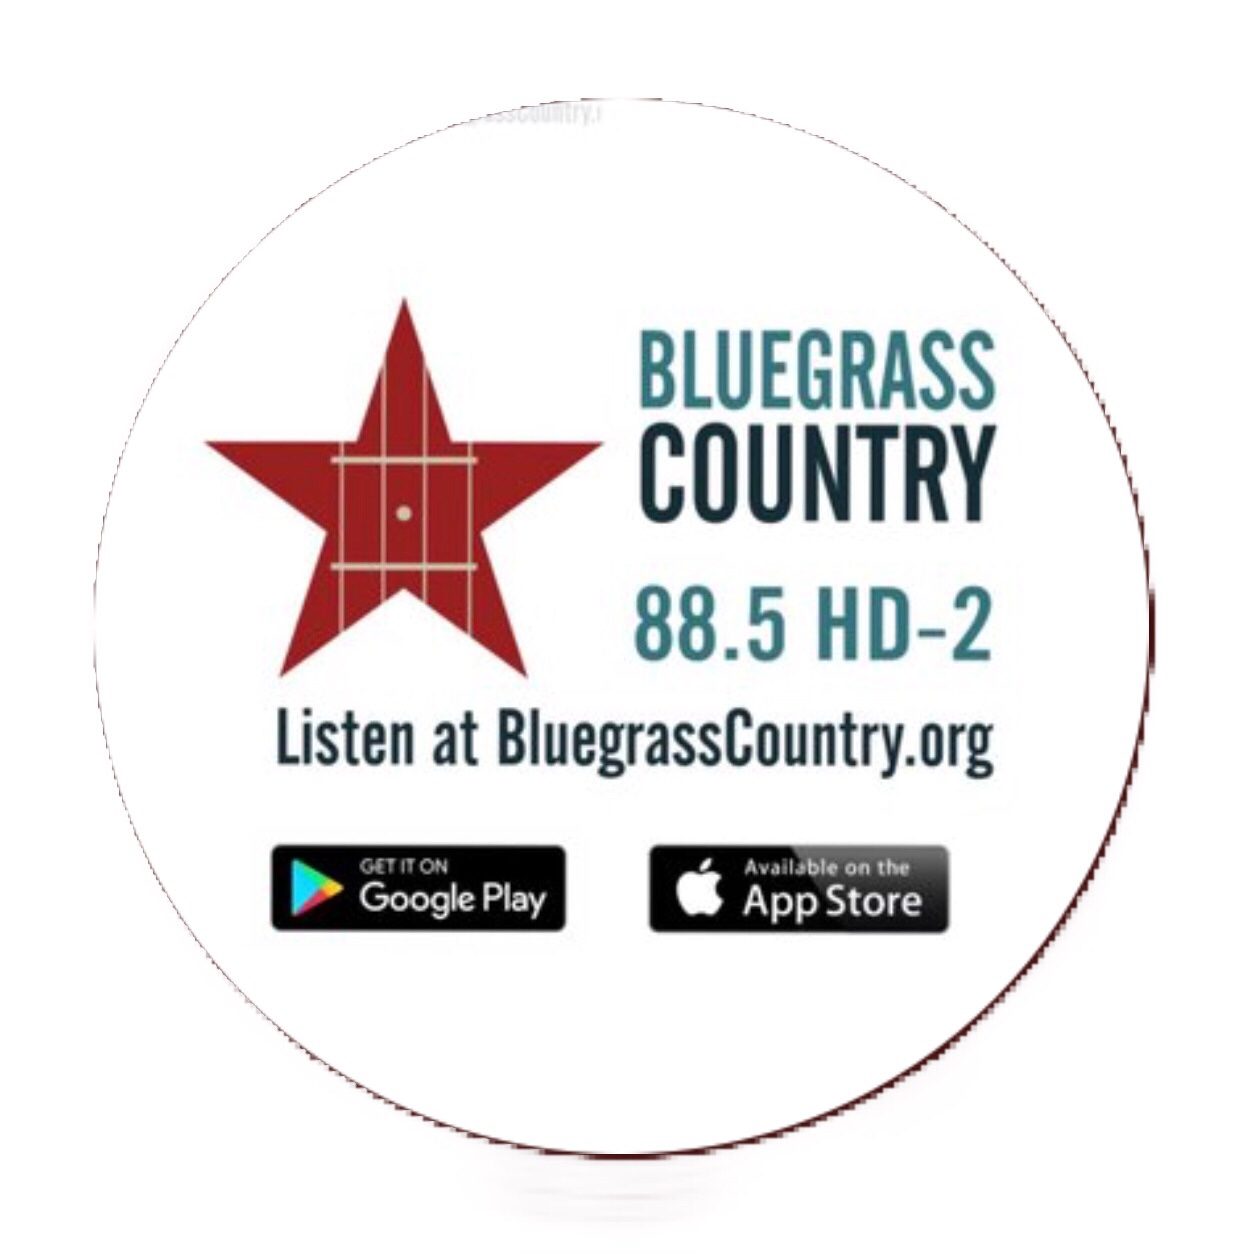 Bluegras country radio